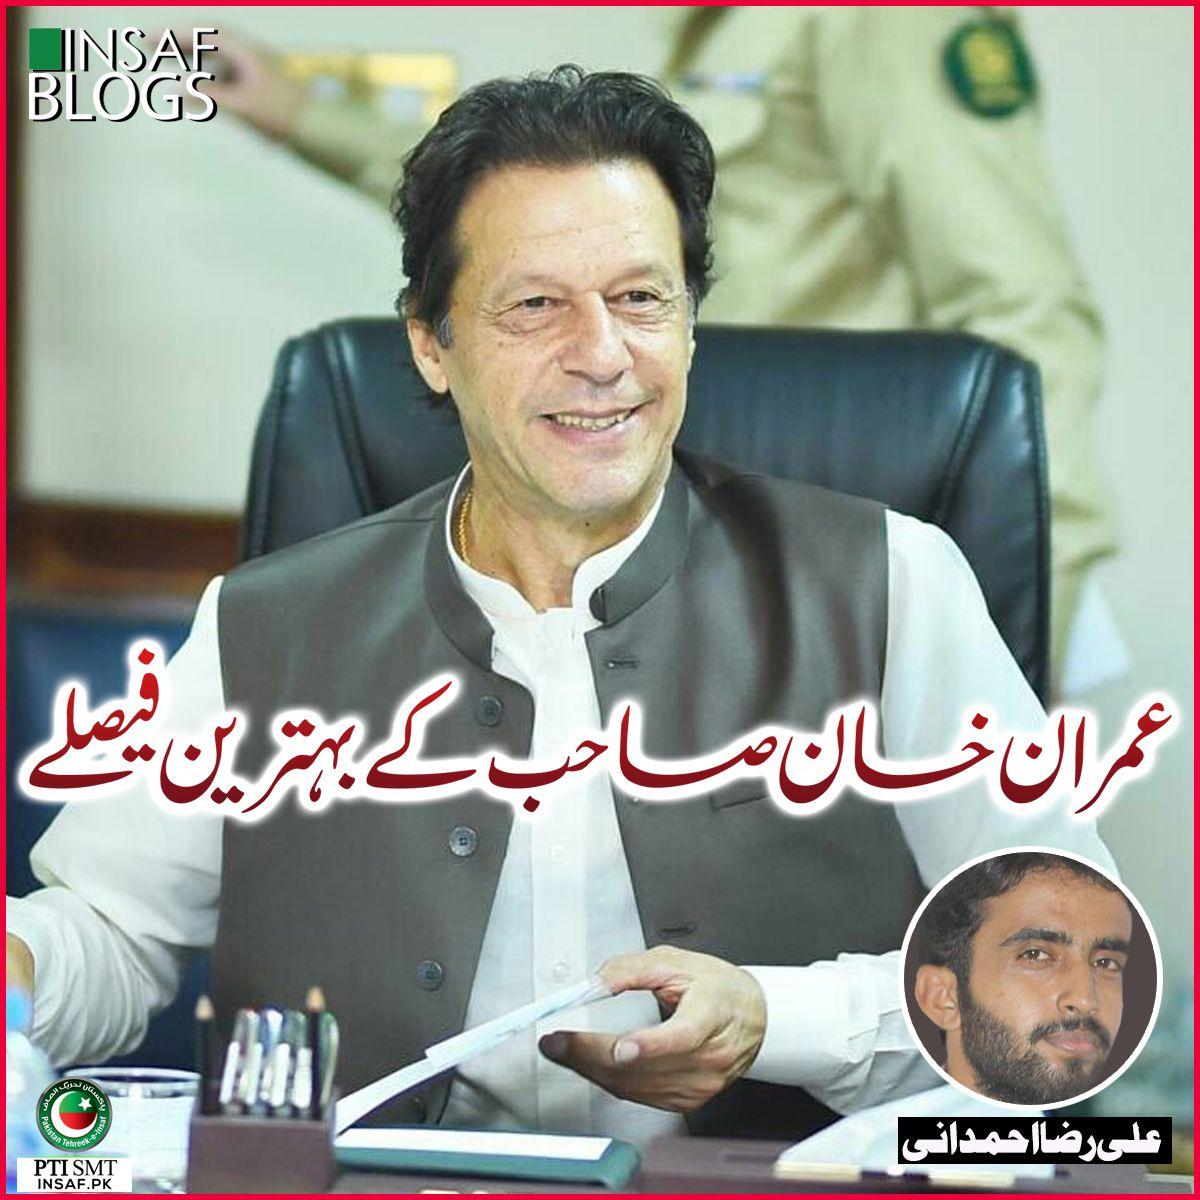 Imran Khan's best decisions - Insaf Blog